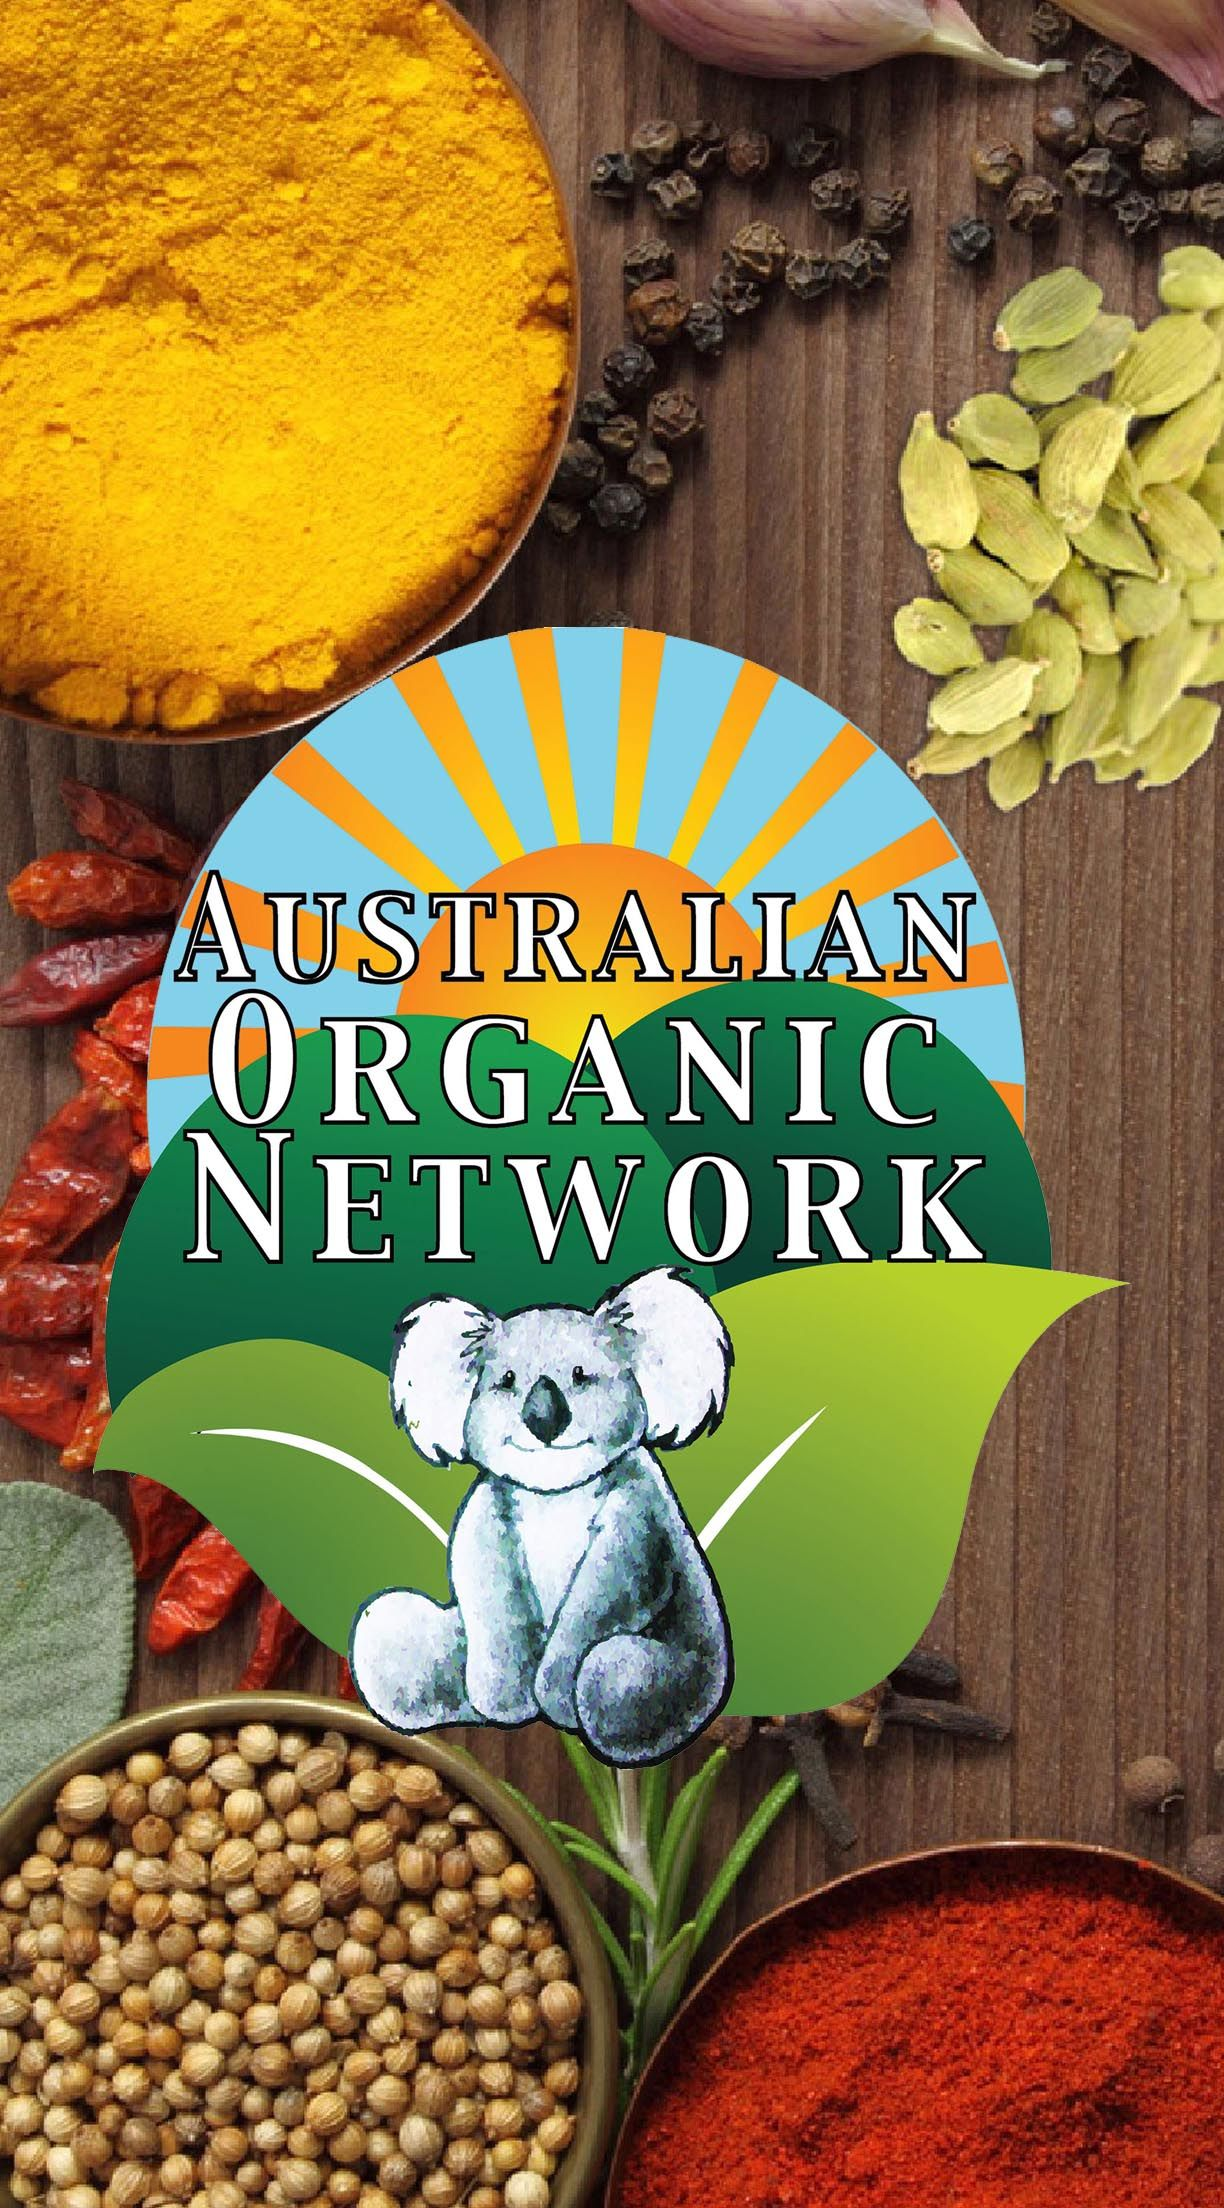 Australian Organic Network Is Australia S Premium Supplier Of